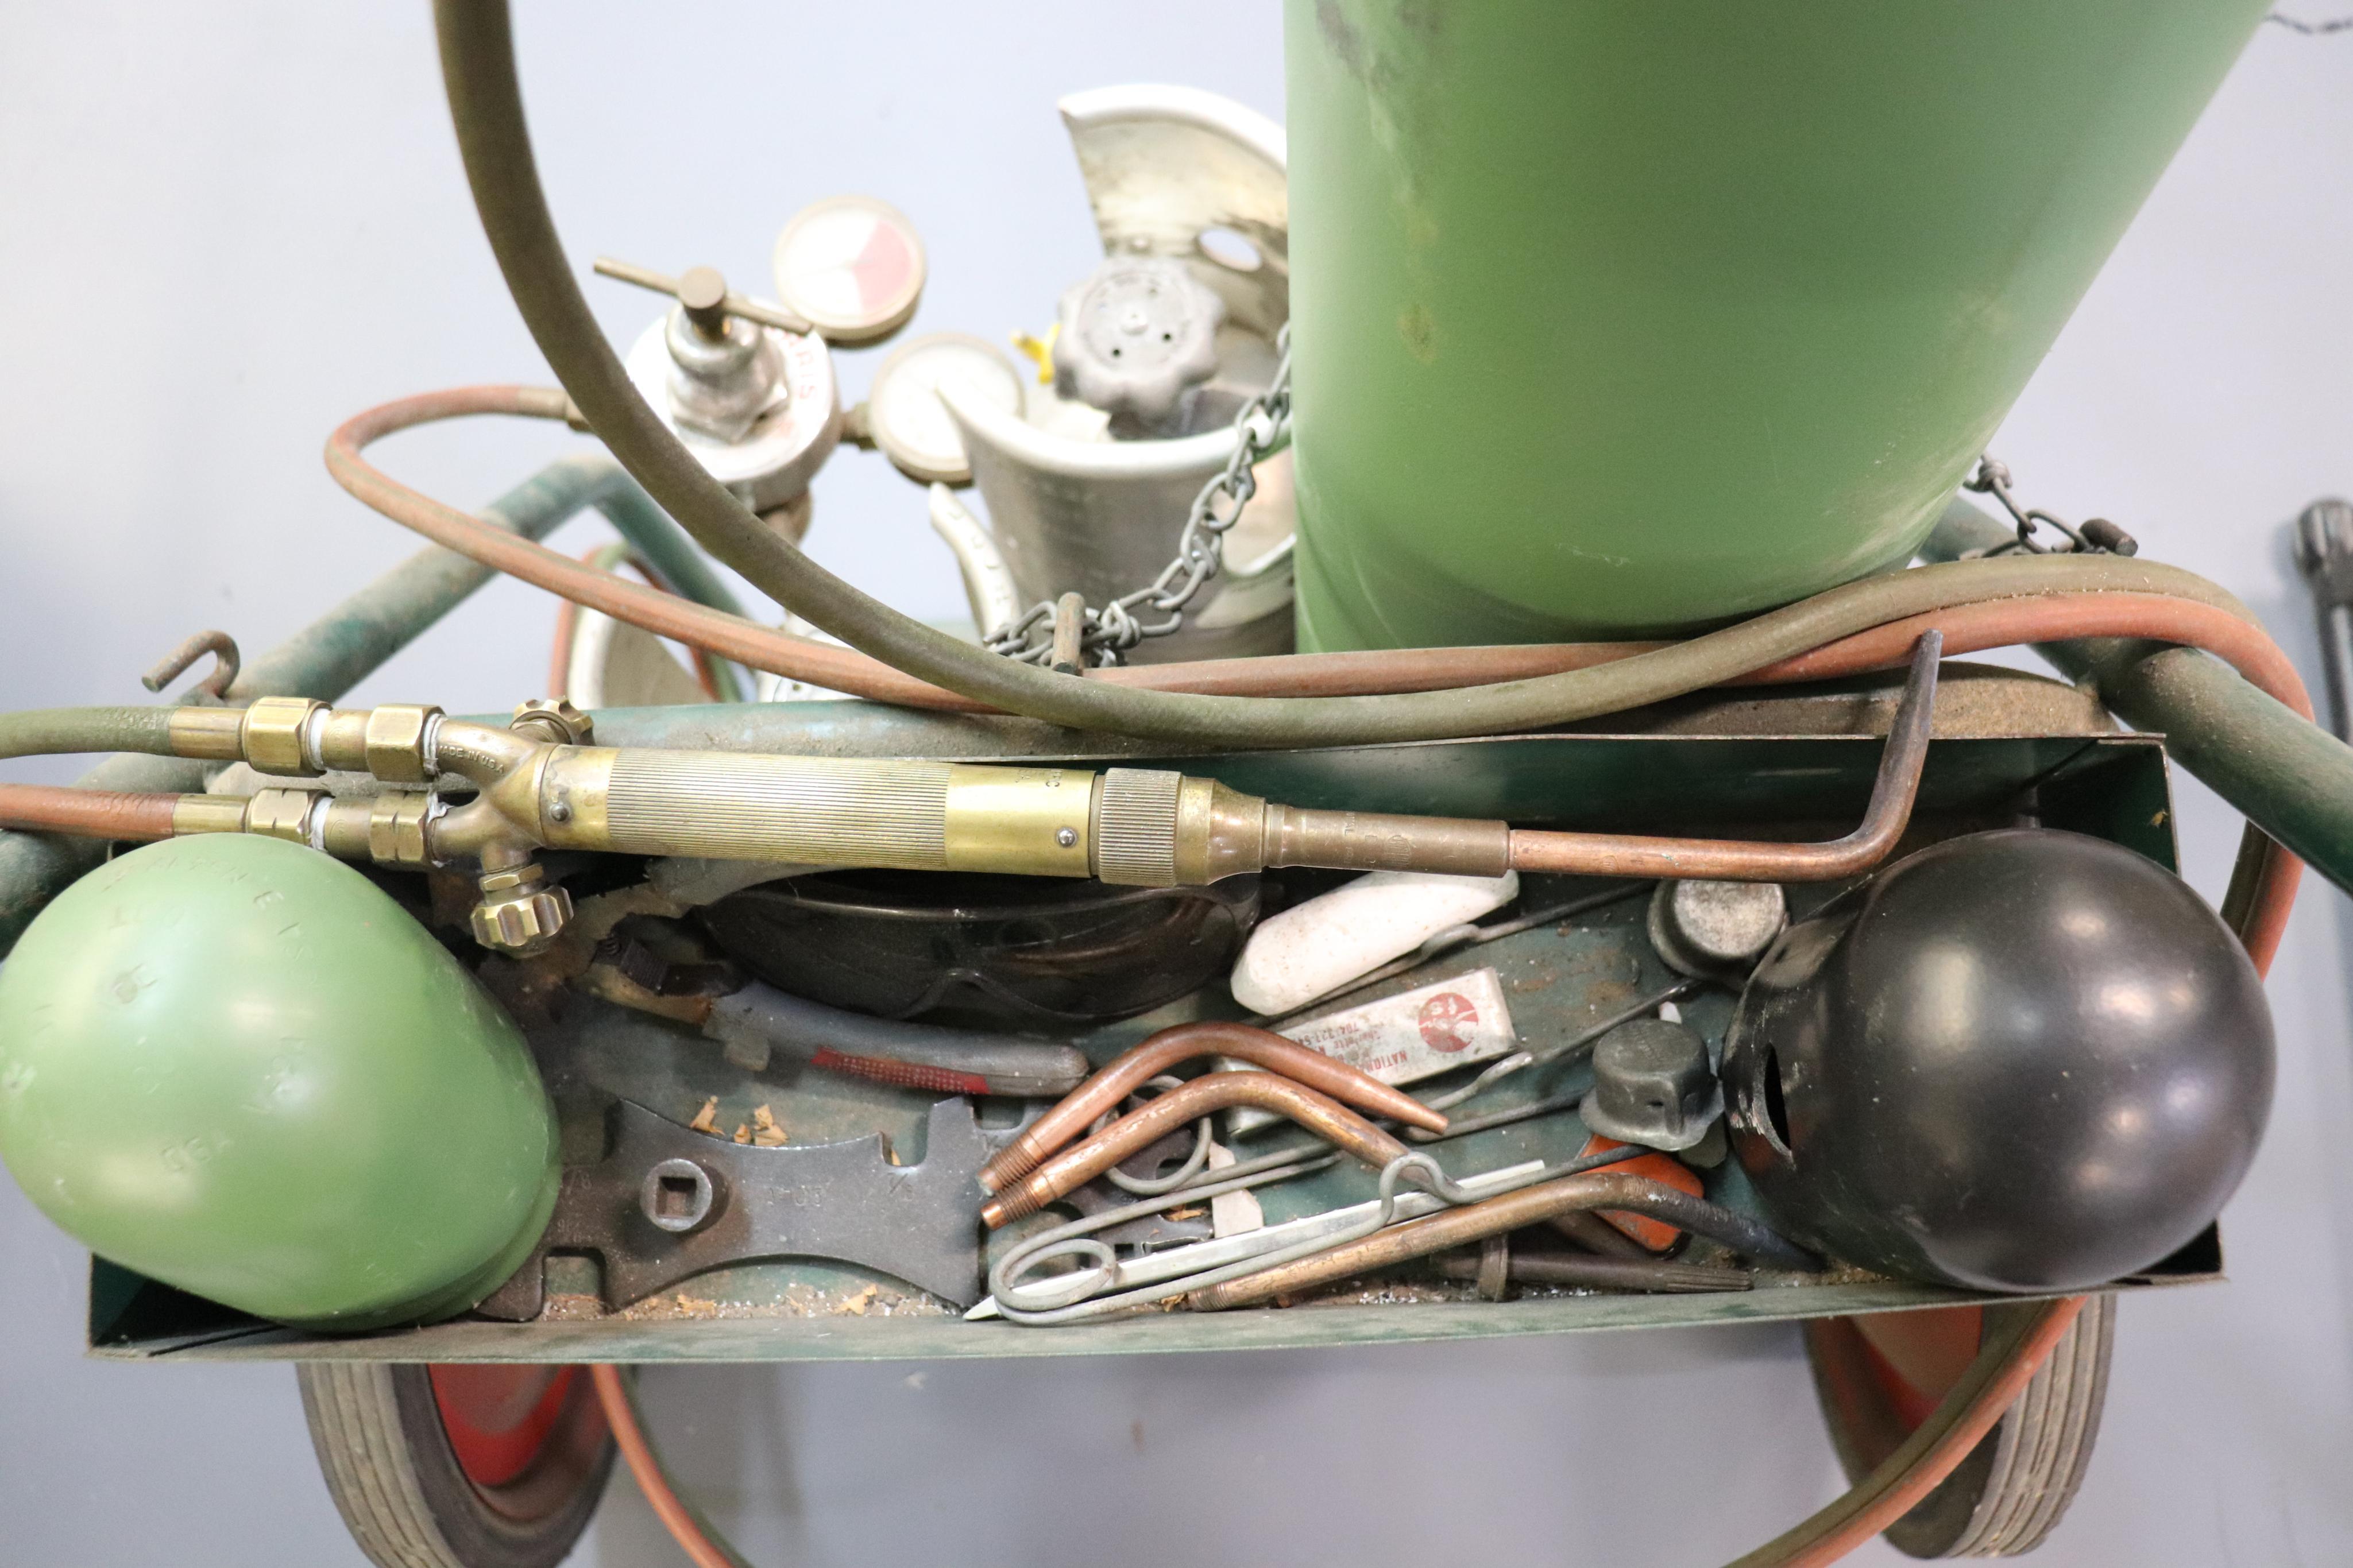 Braising torch & cart - Image 3 of 3